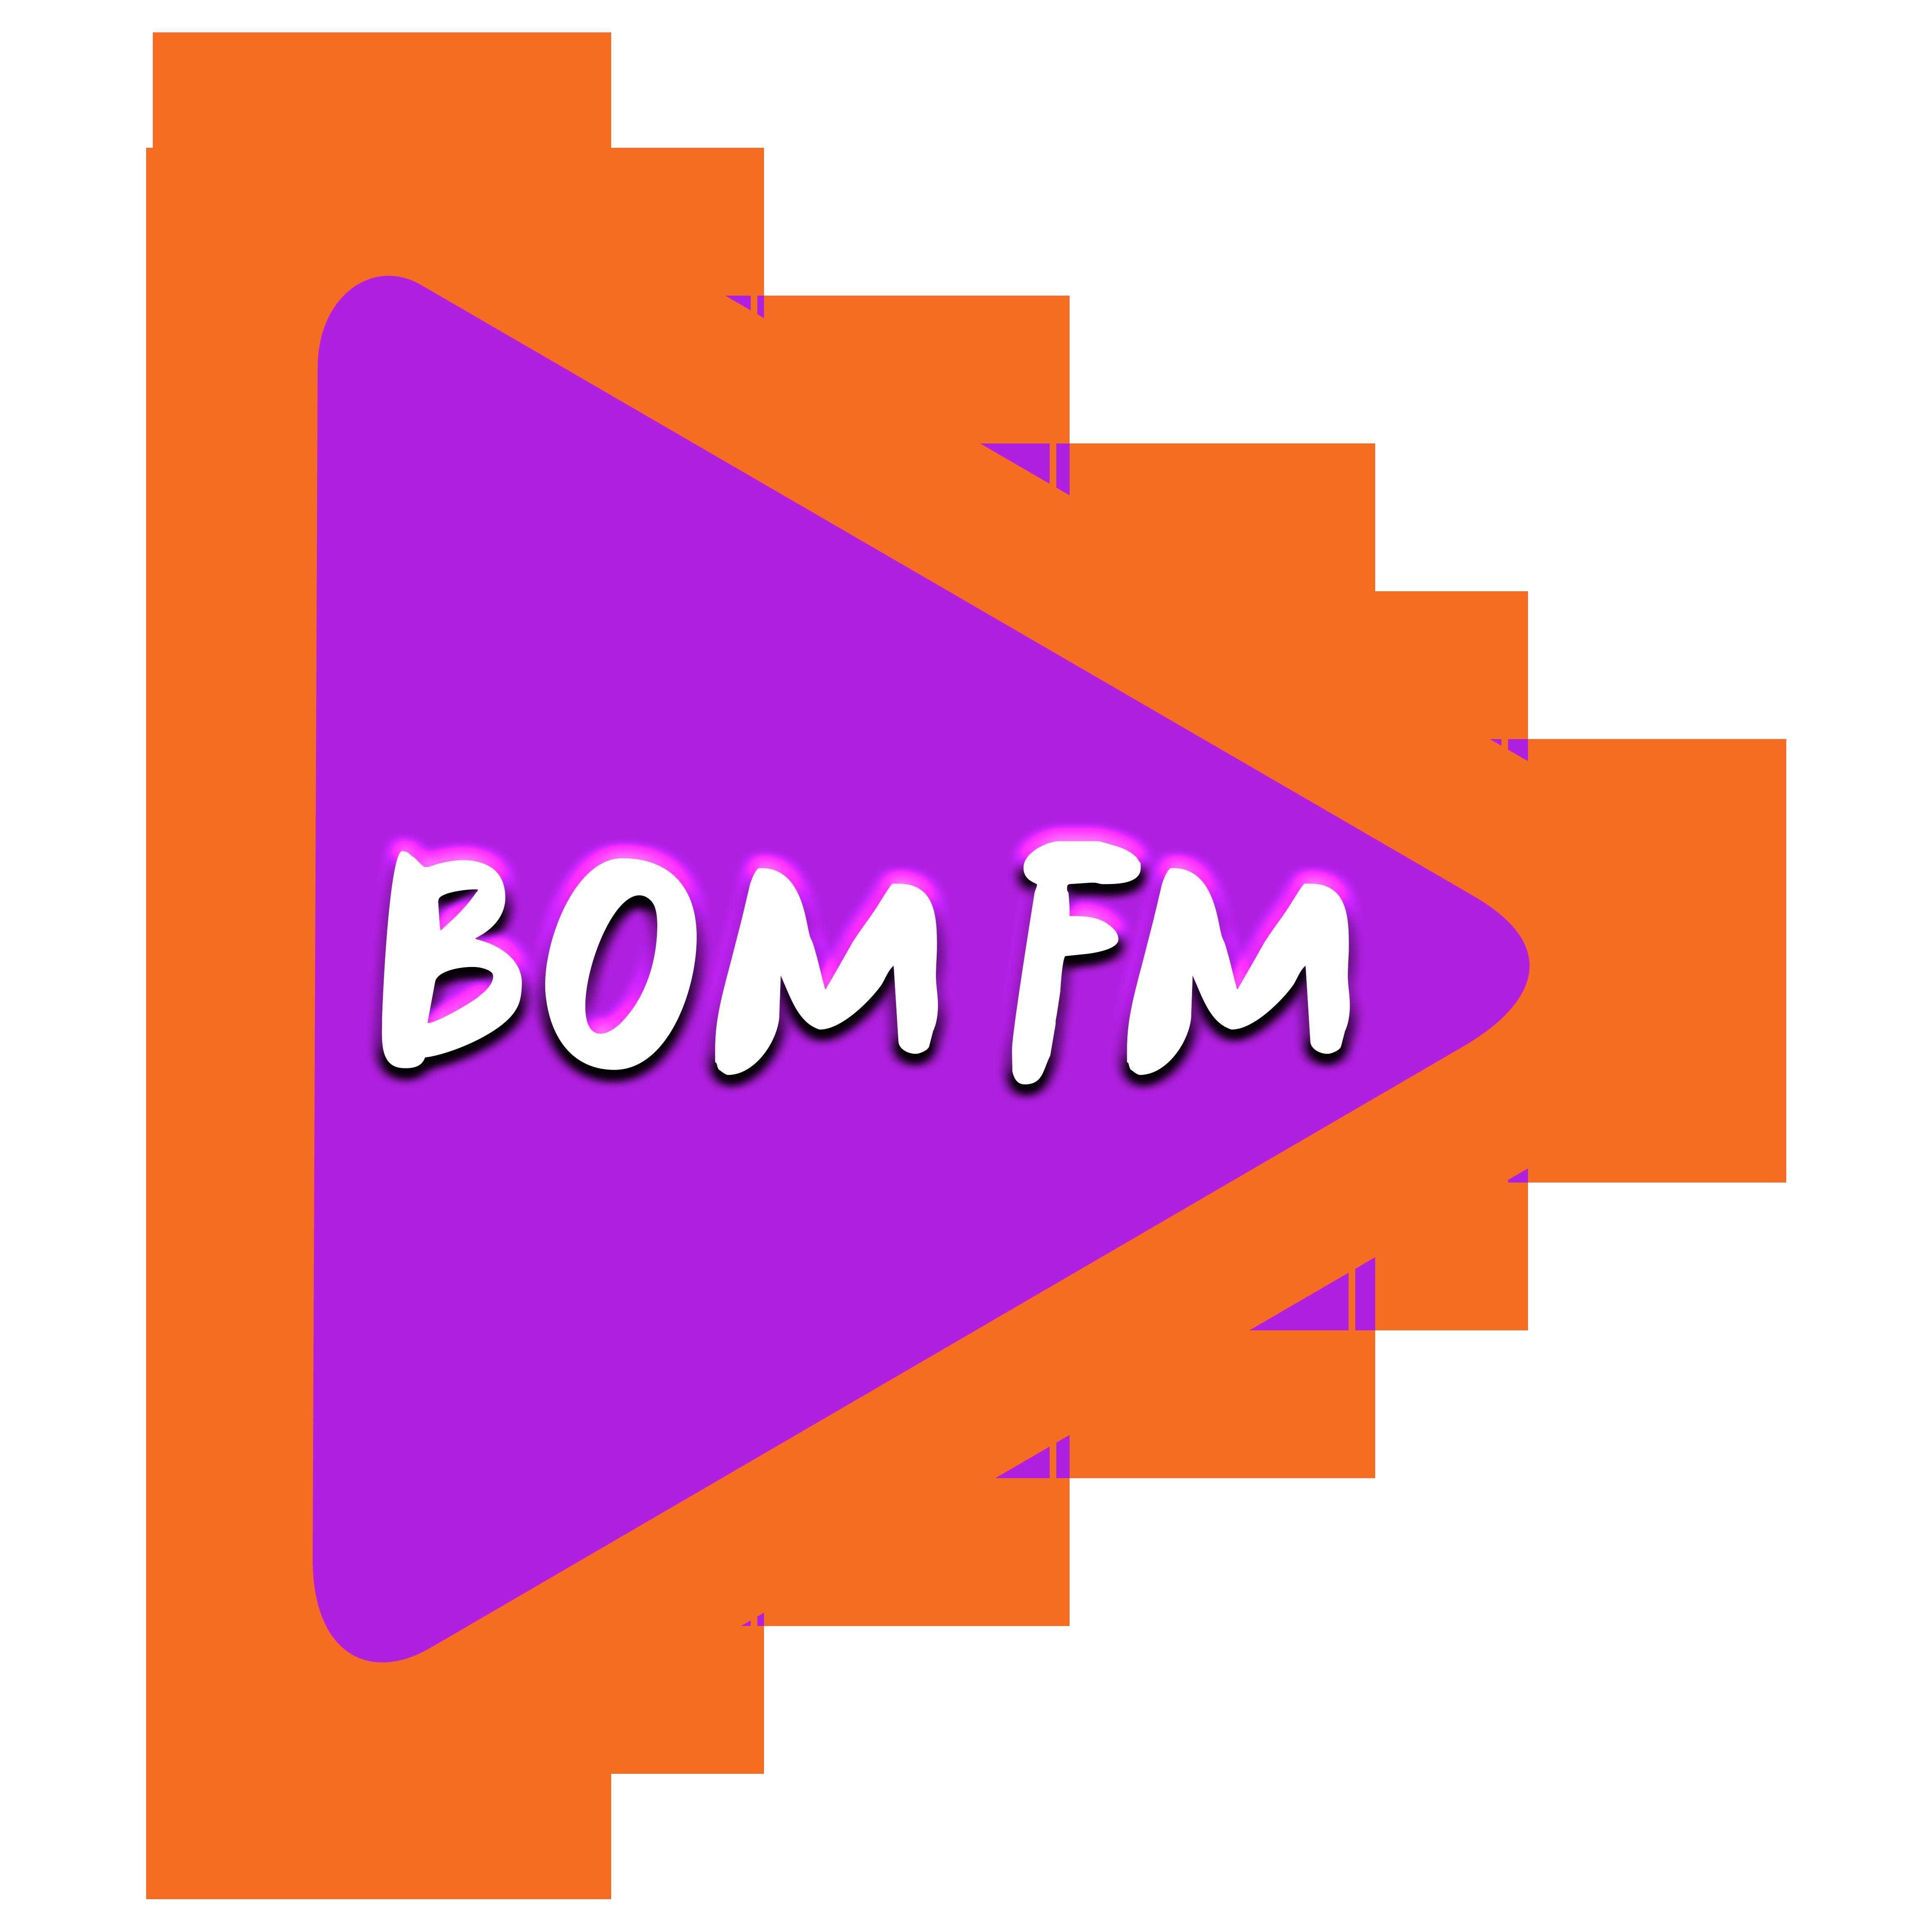 BomFm